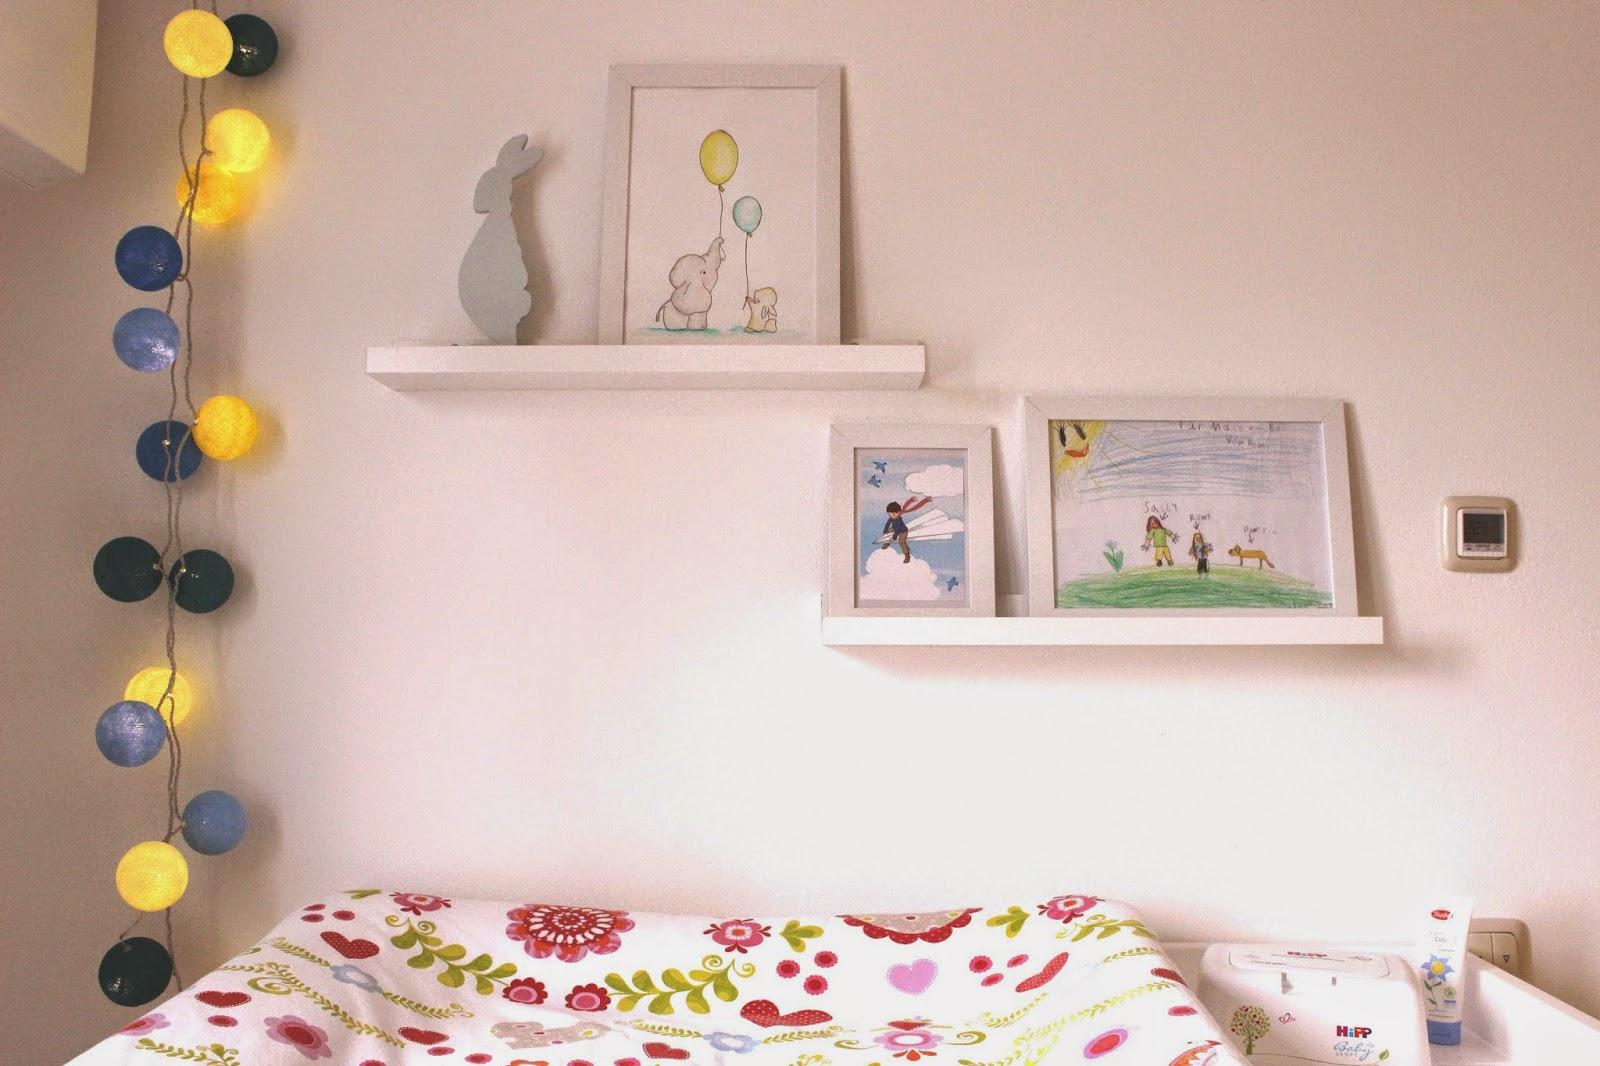 Kleeblatt: children's room kinderzimmer